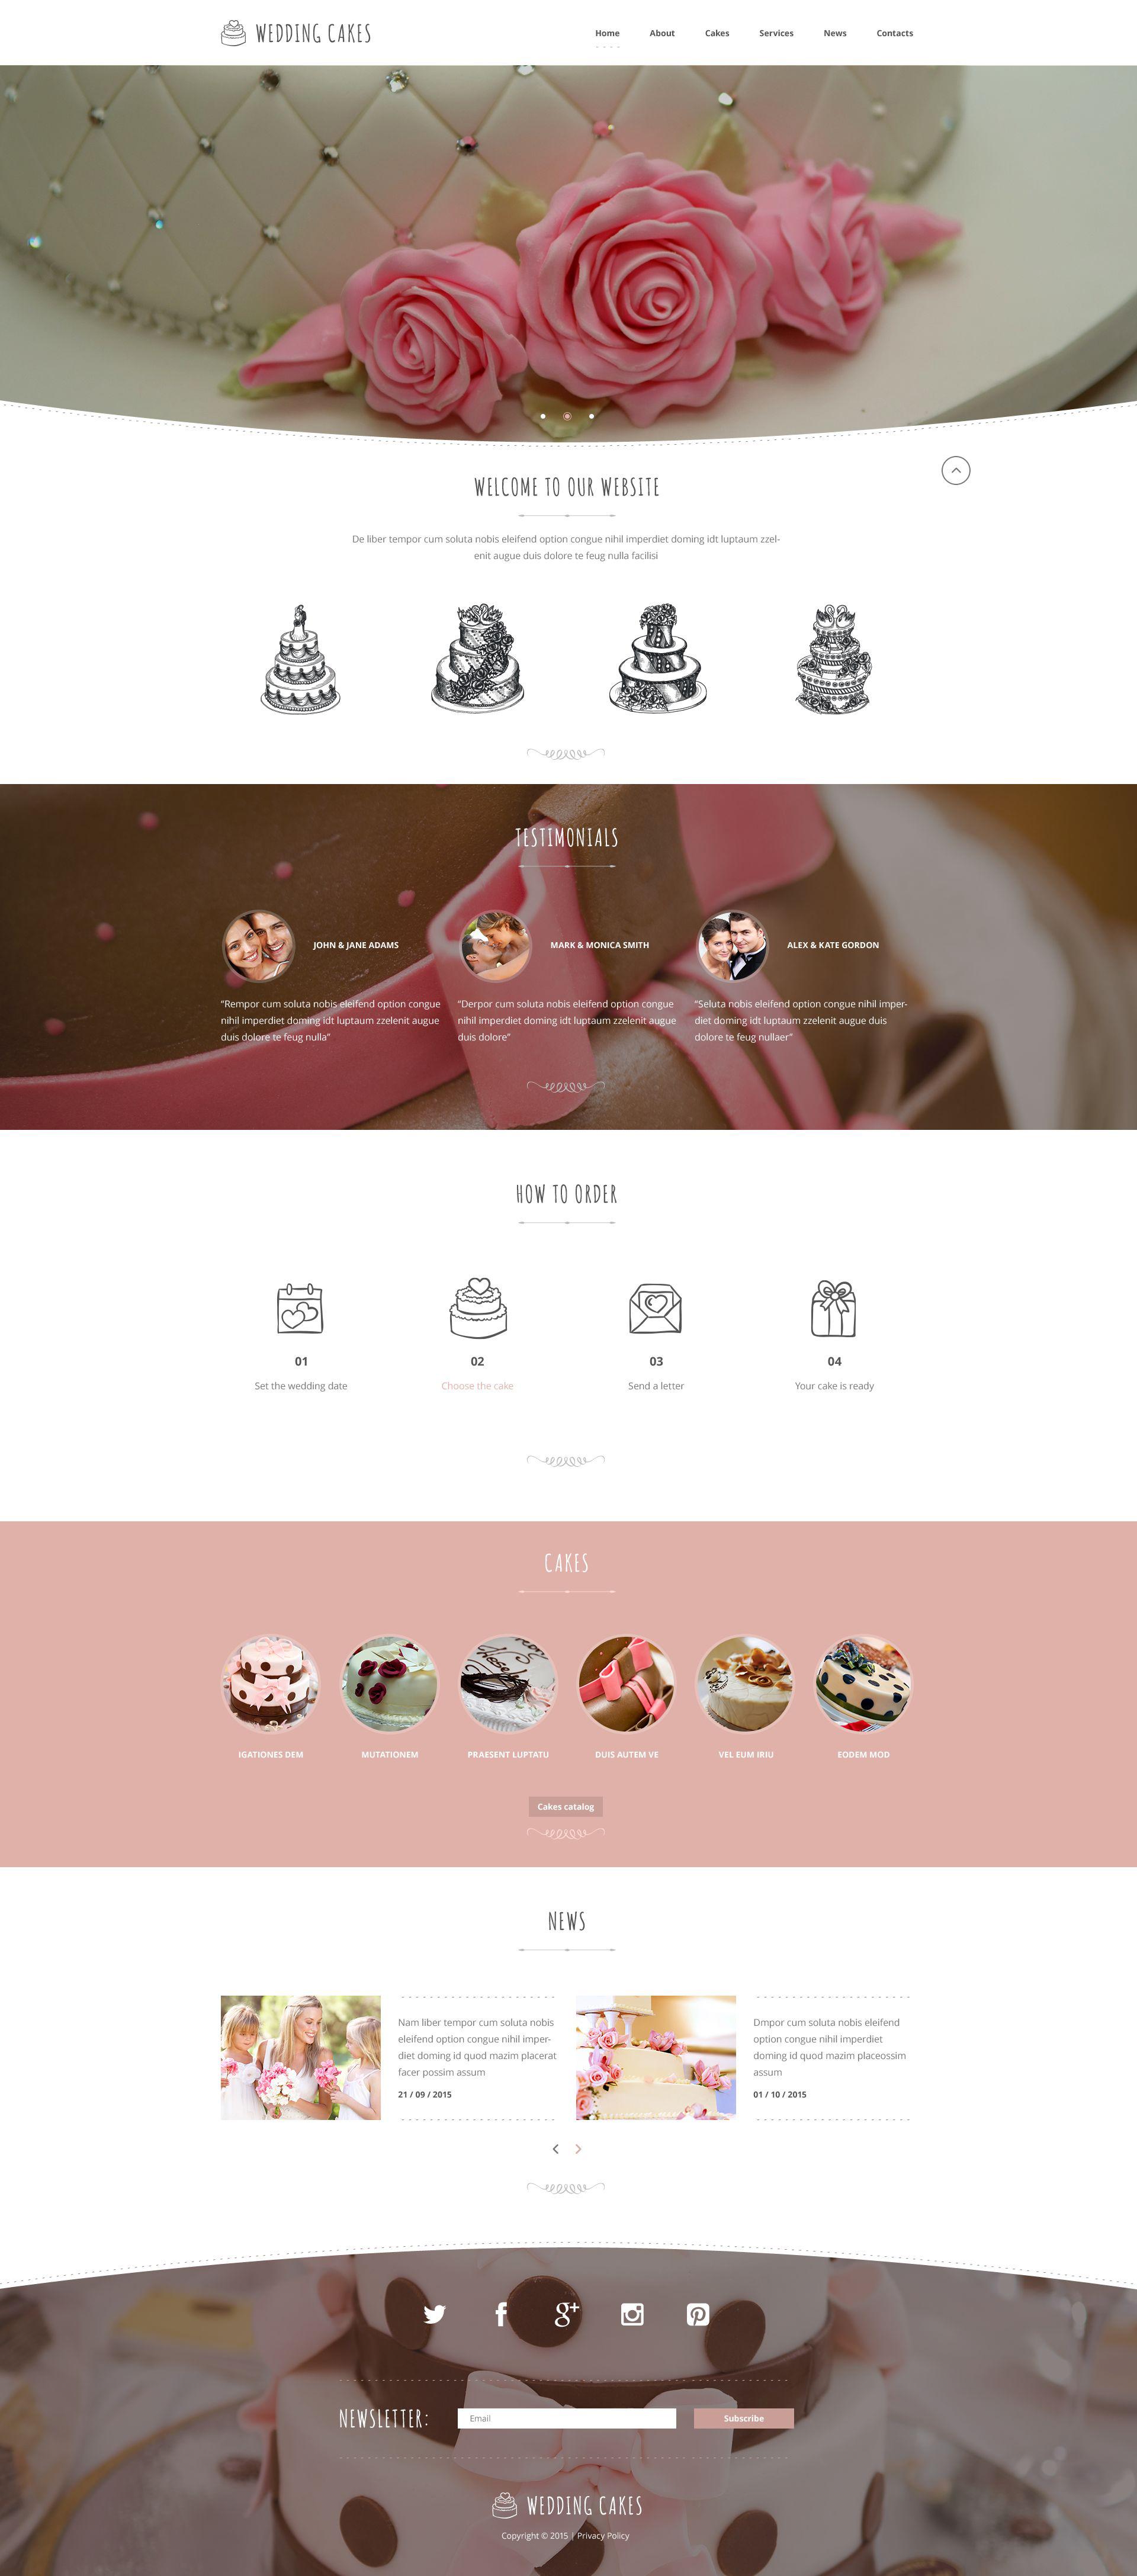 """Wedding Cake Co"" - адаптивний Шаблон сайту №53978 - скріншот"